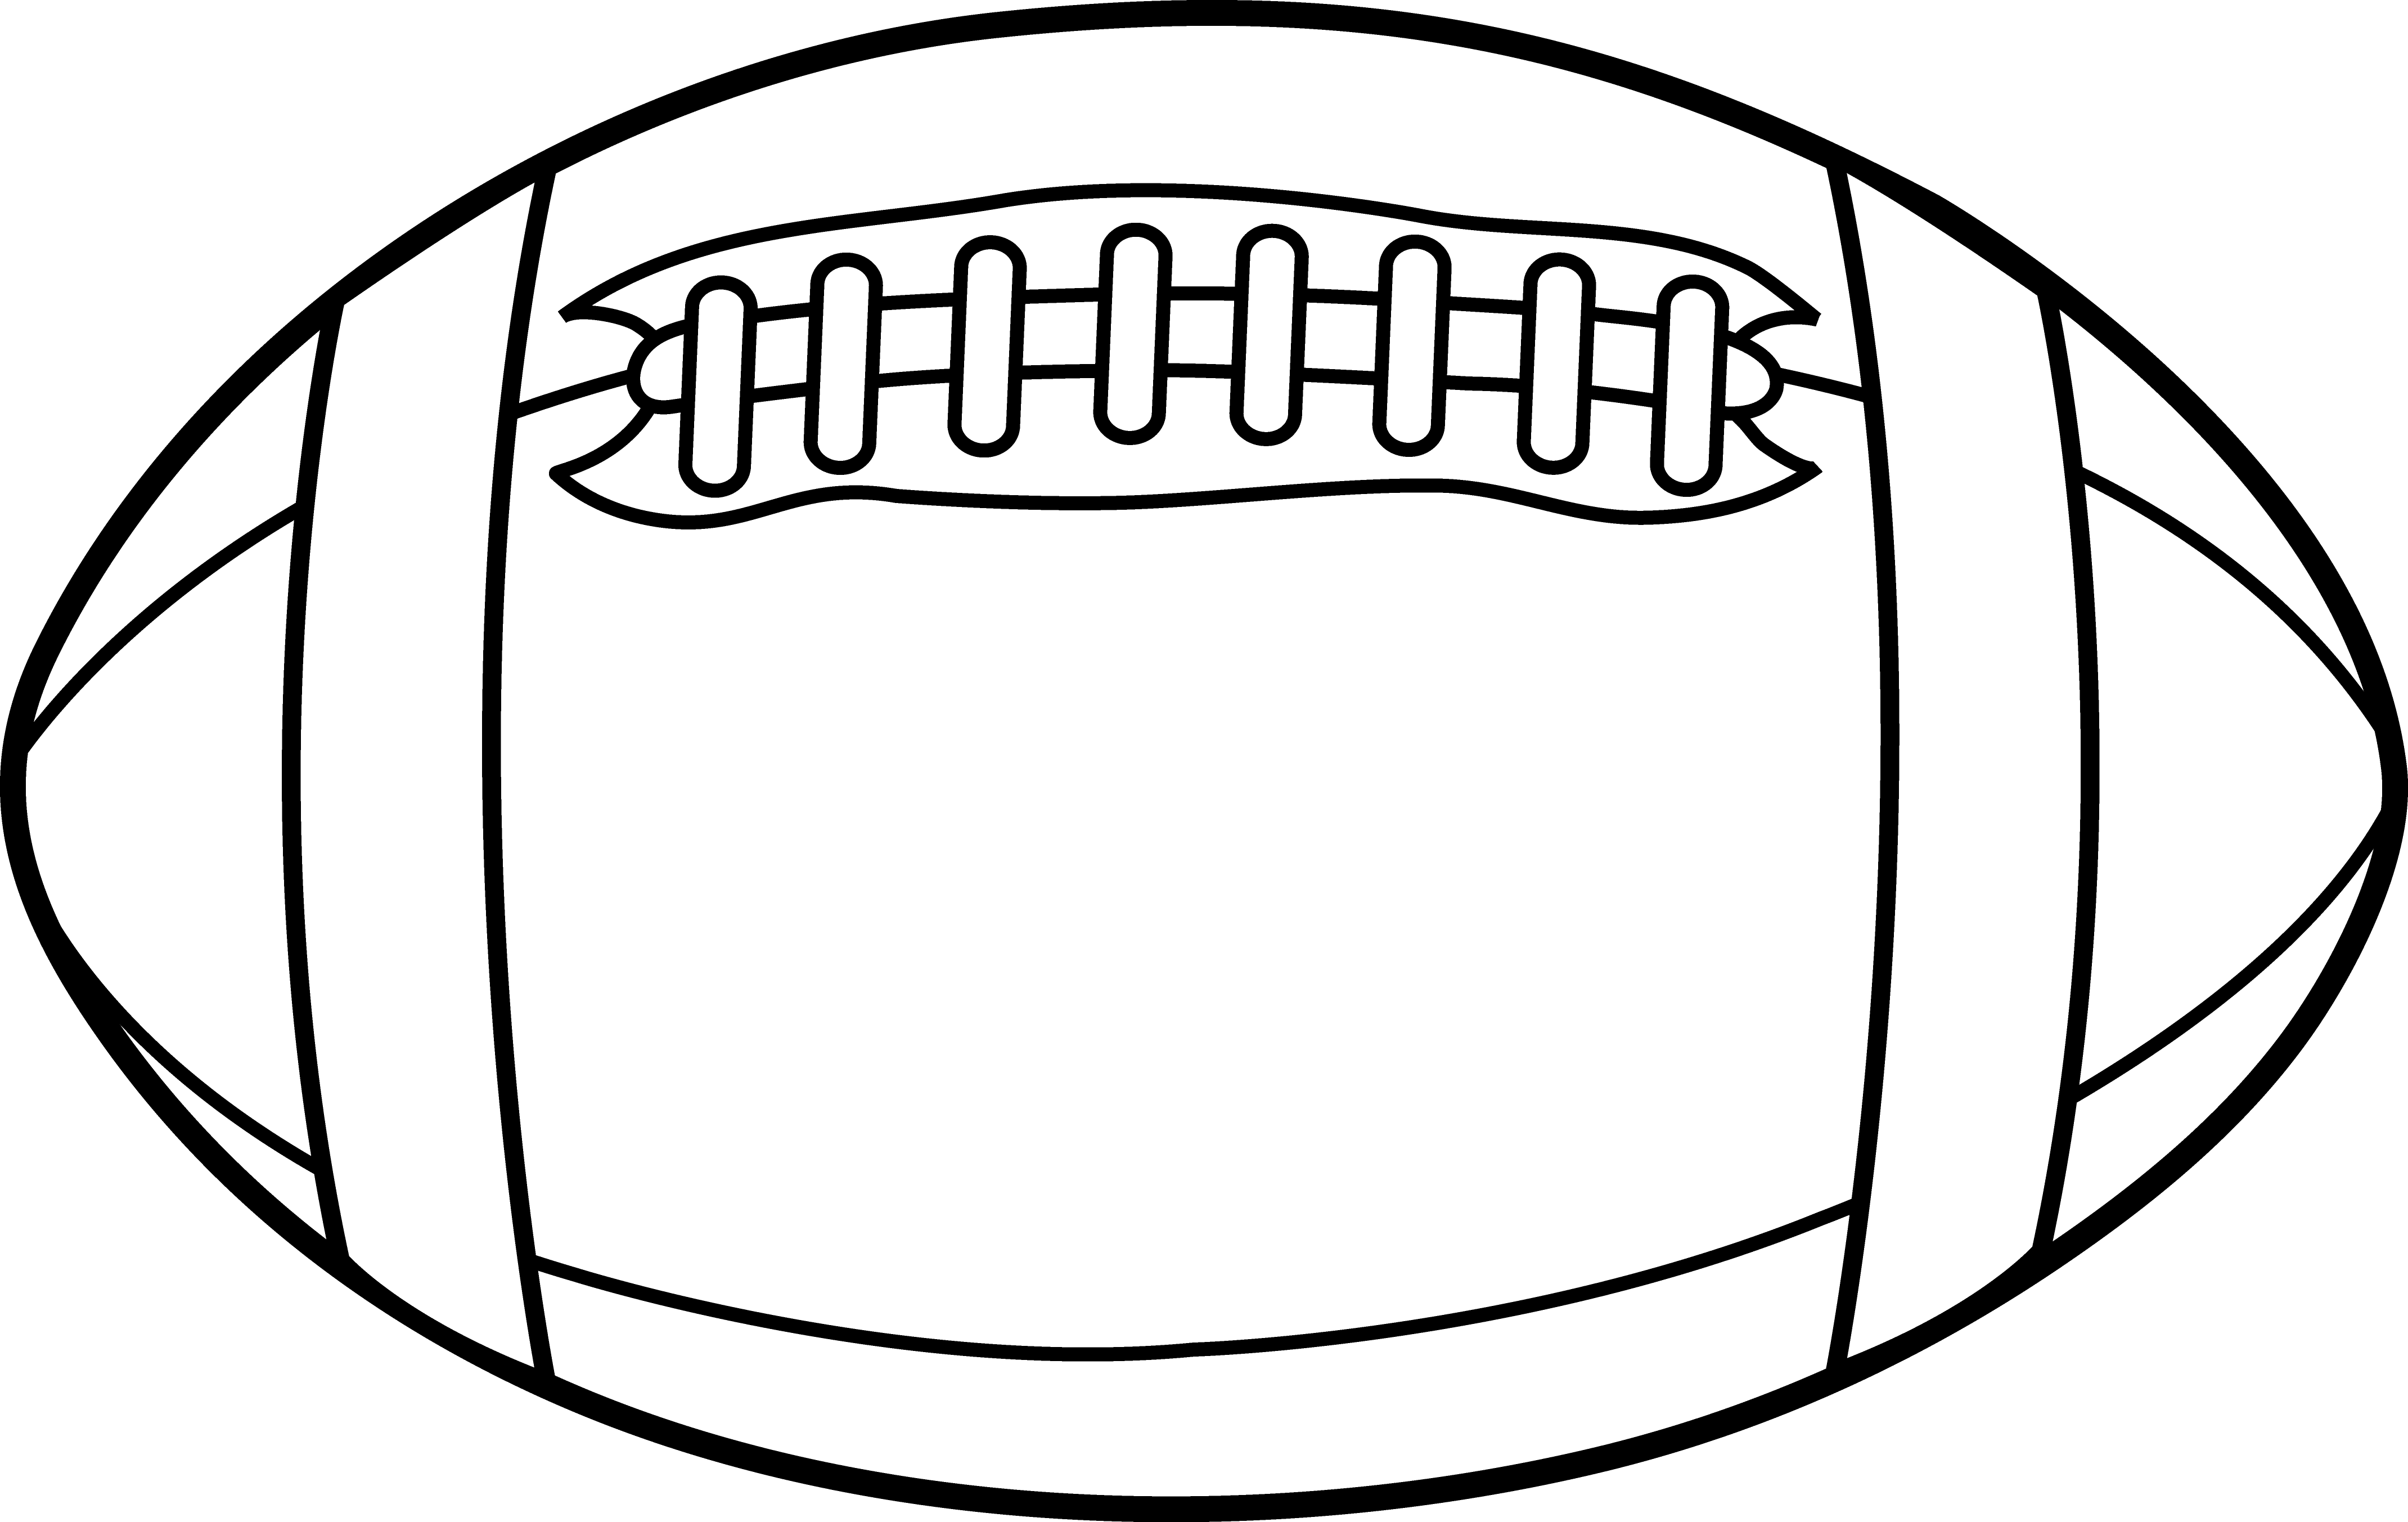 Pin De Enosart Com En Black And White Clipart Balones De Rugby Plantillas Para Dibujar Imprimir Sobres